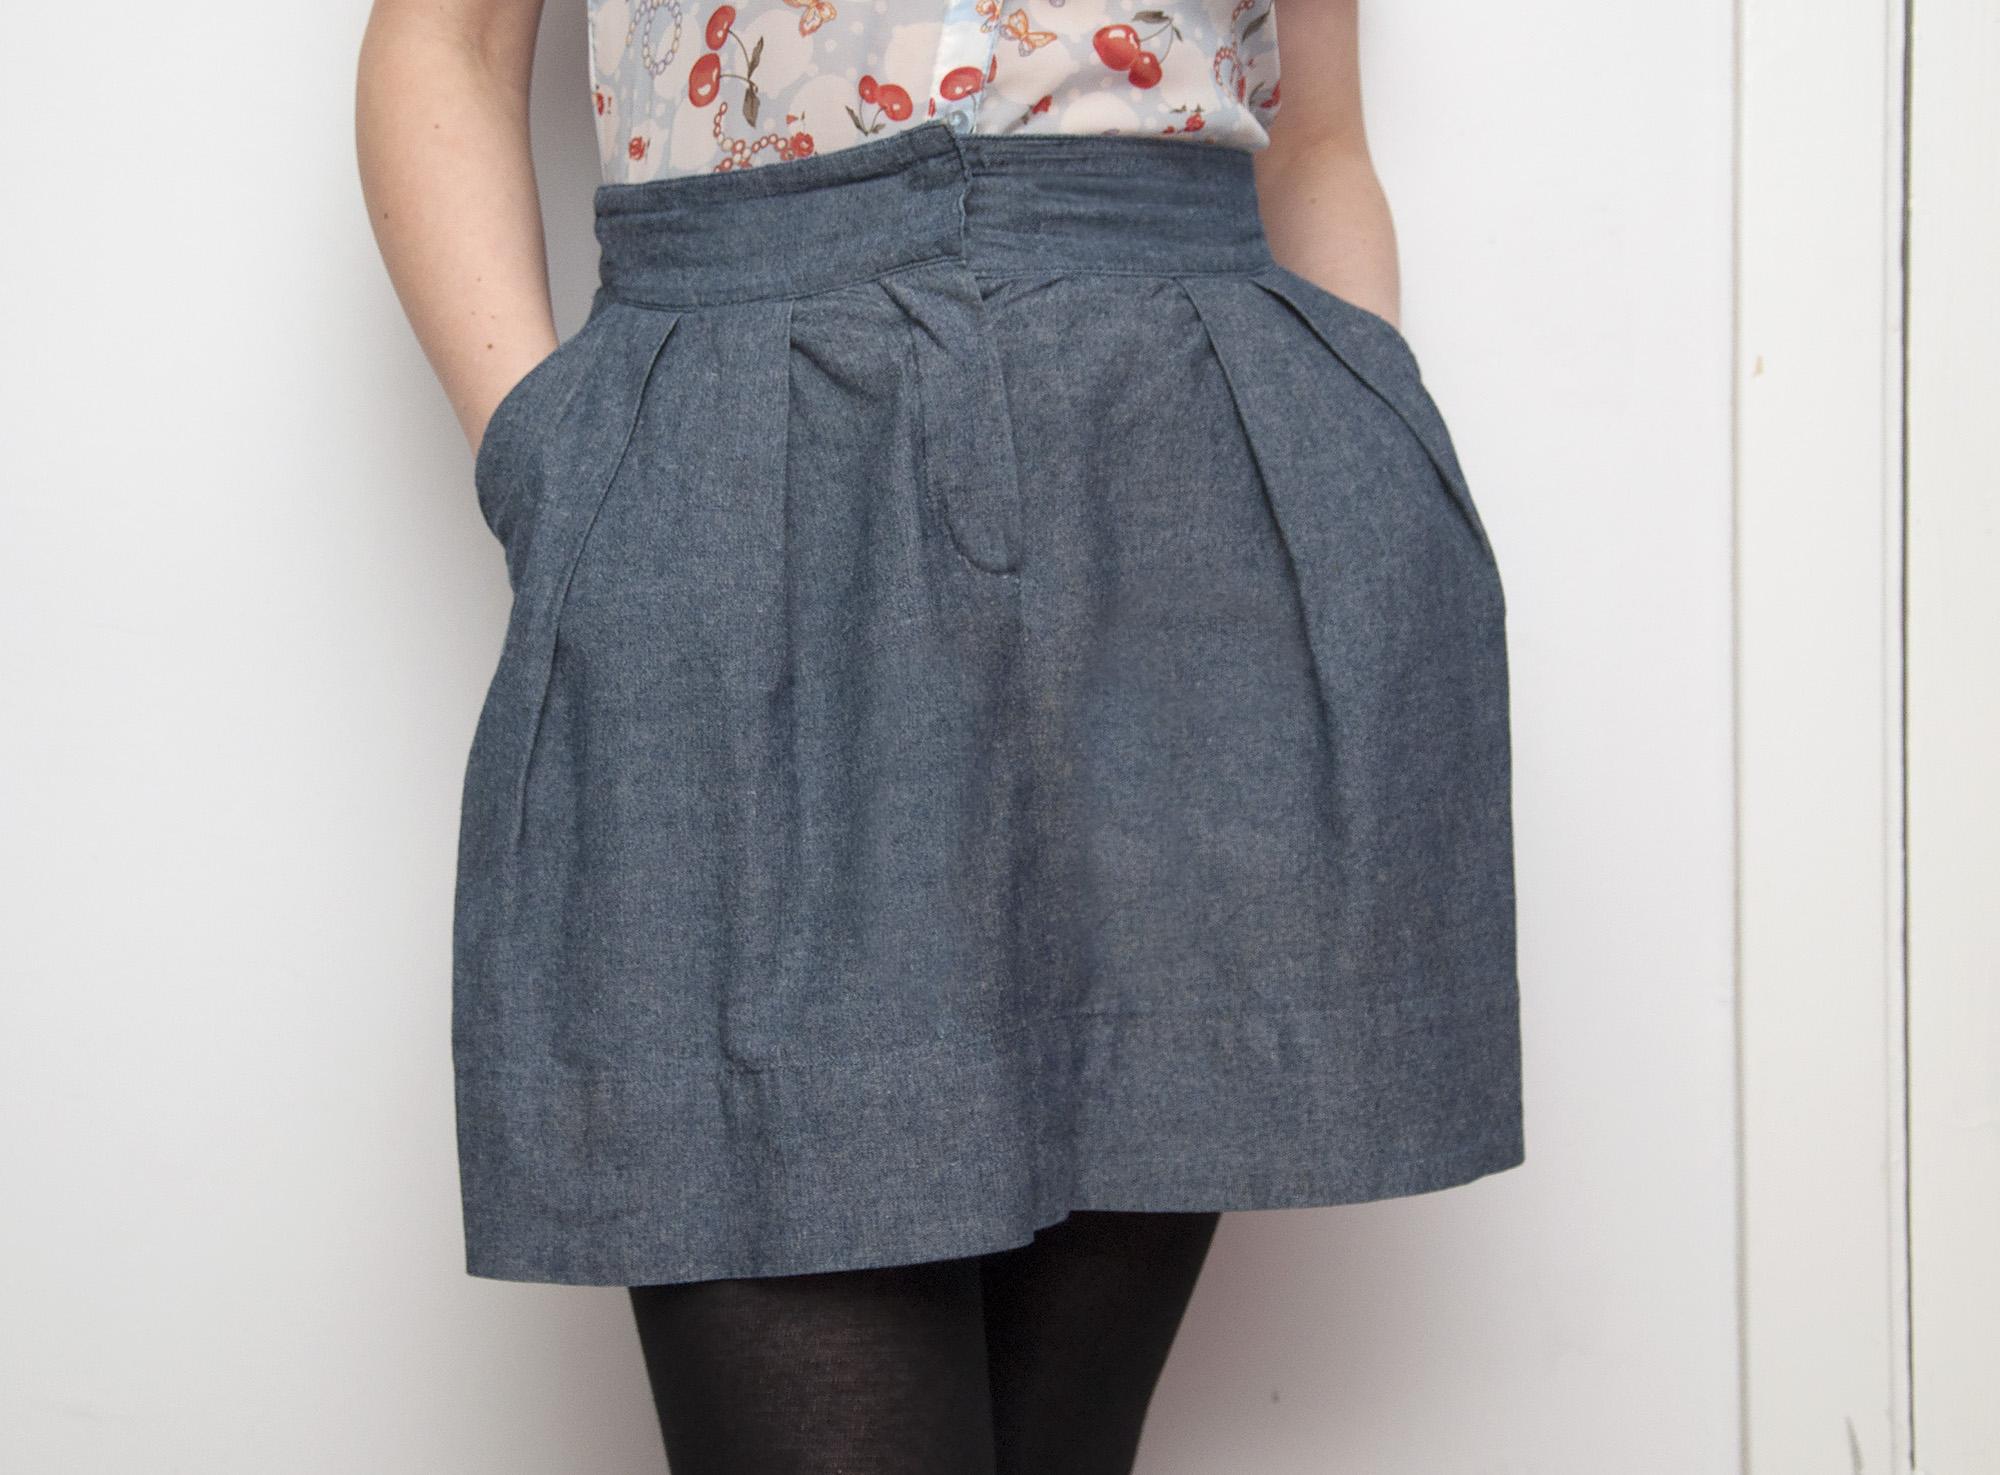 Burdastyle pleated chambray skirt